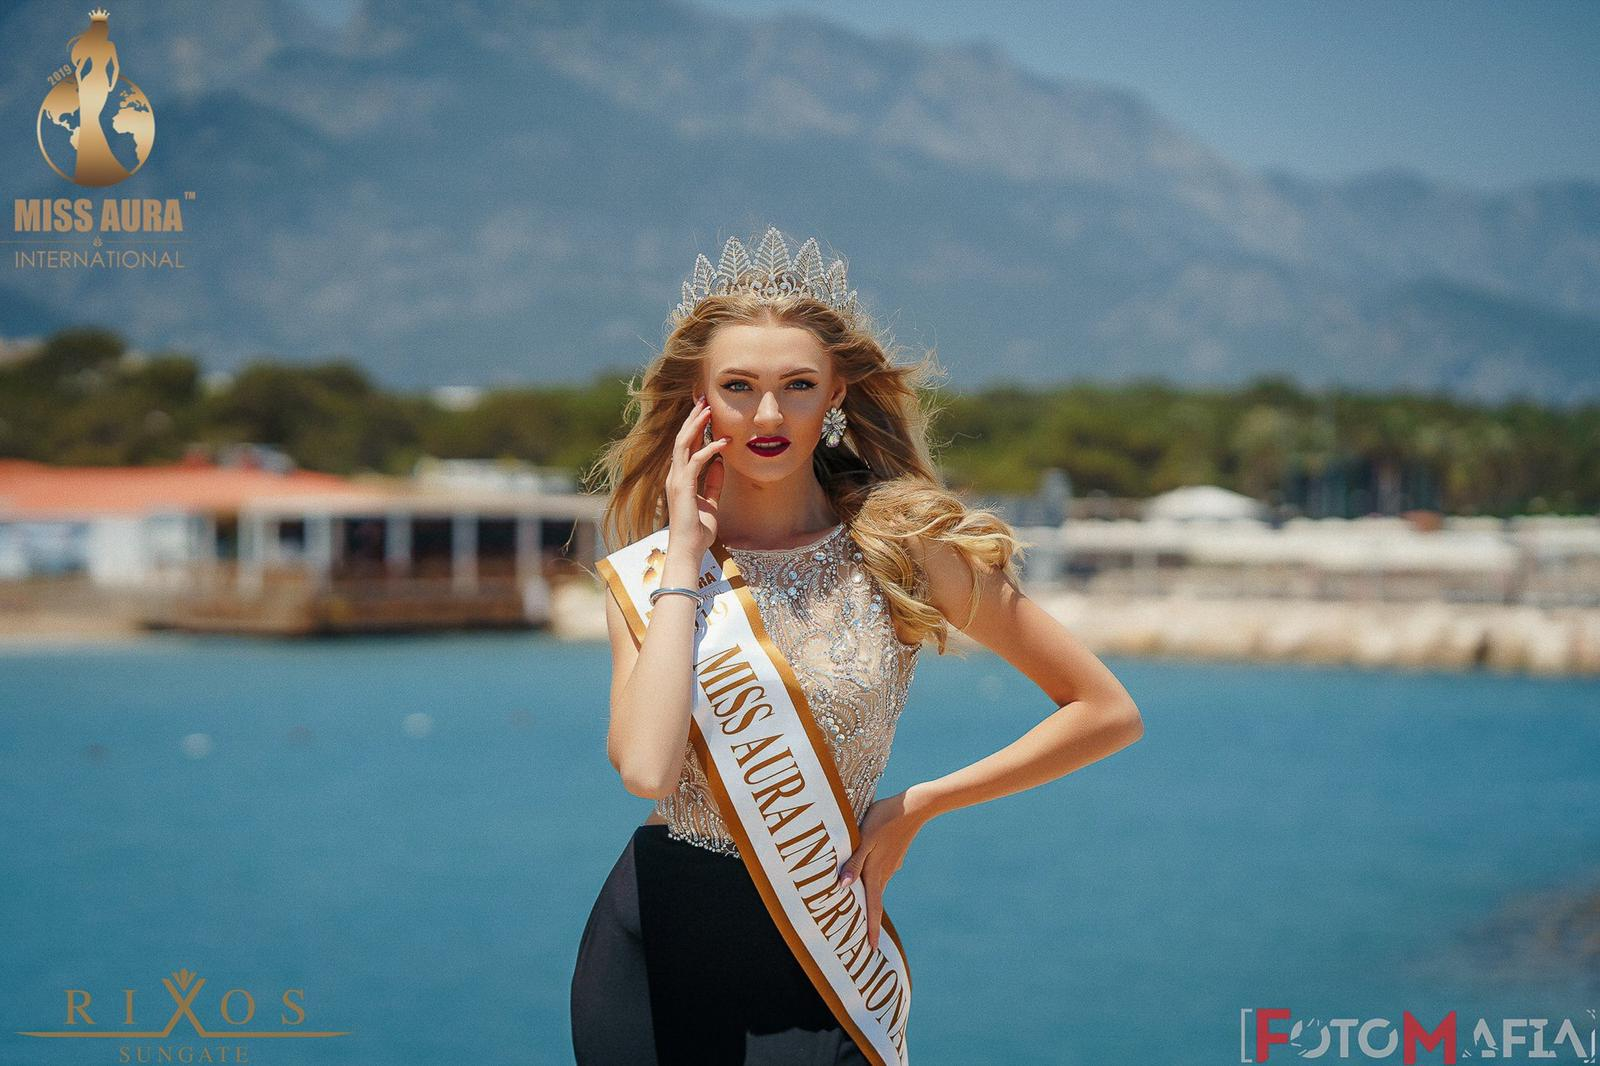 malirova-miss-aura-international (21).jpeg